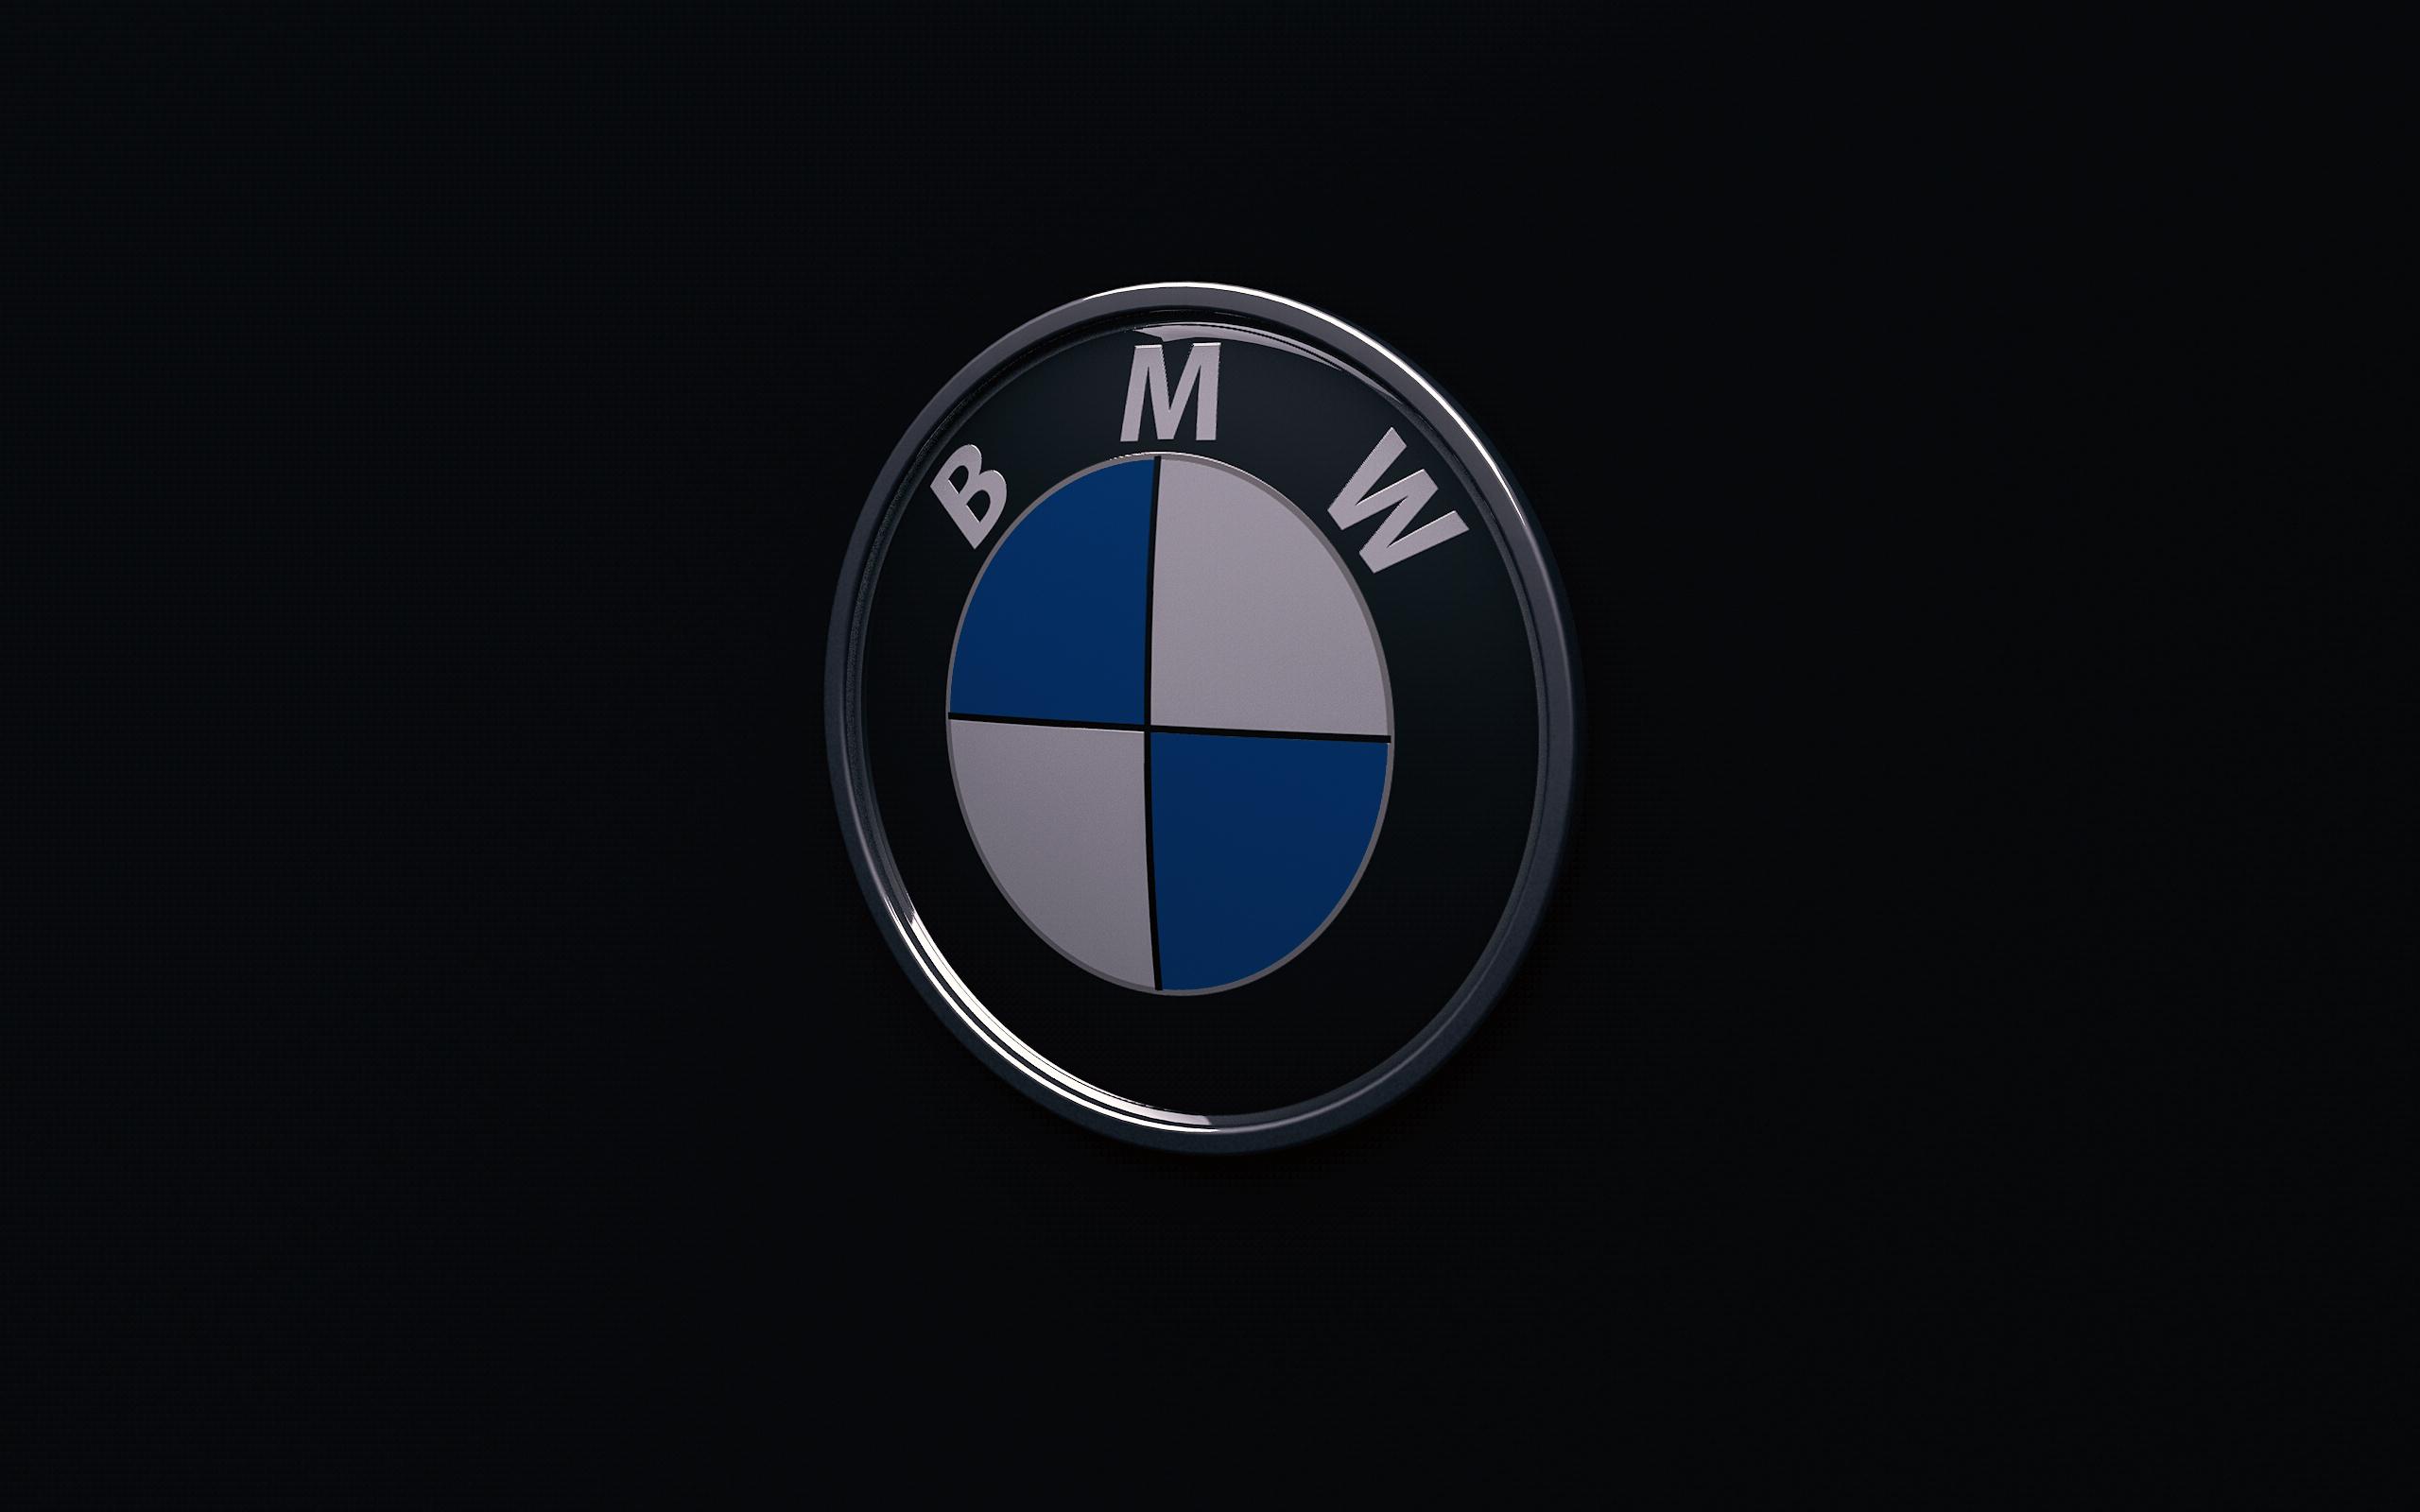 Логотип bmw обои на рабочий стол